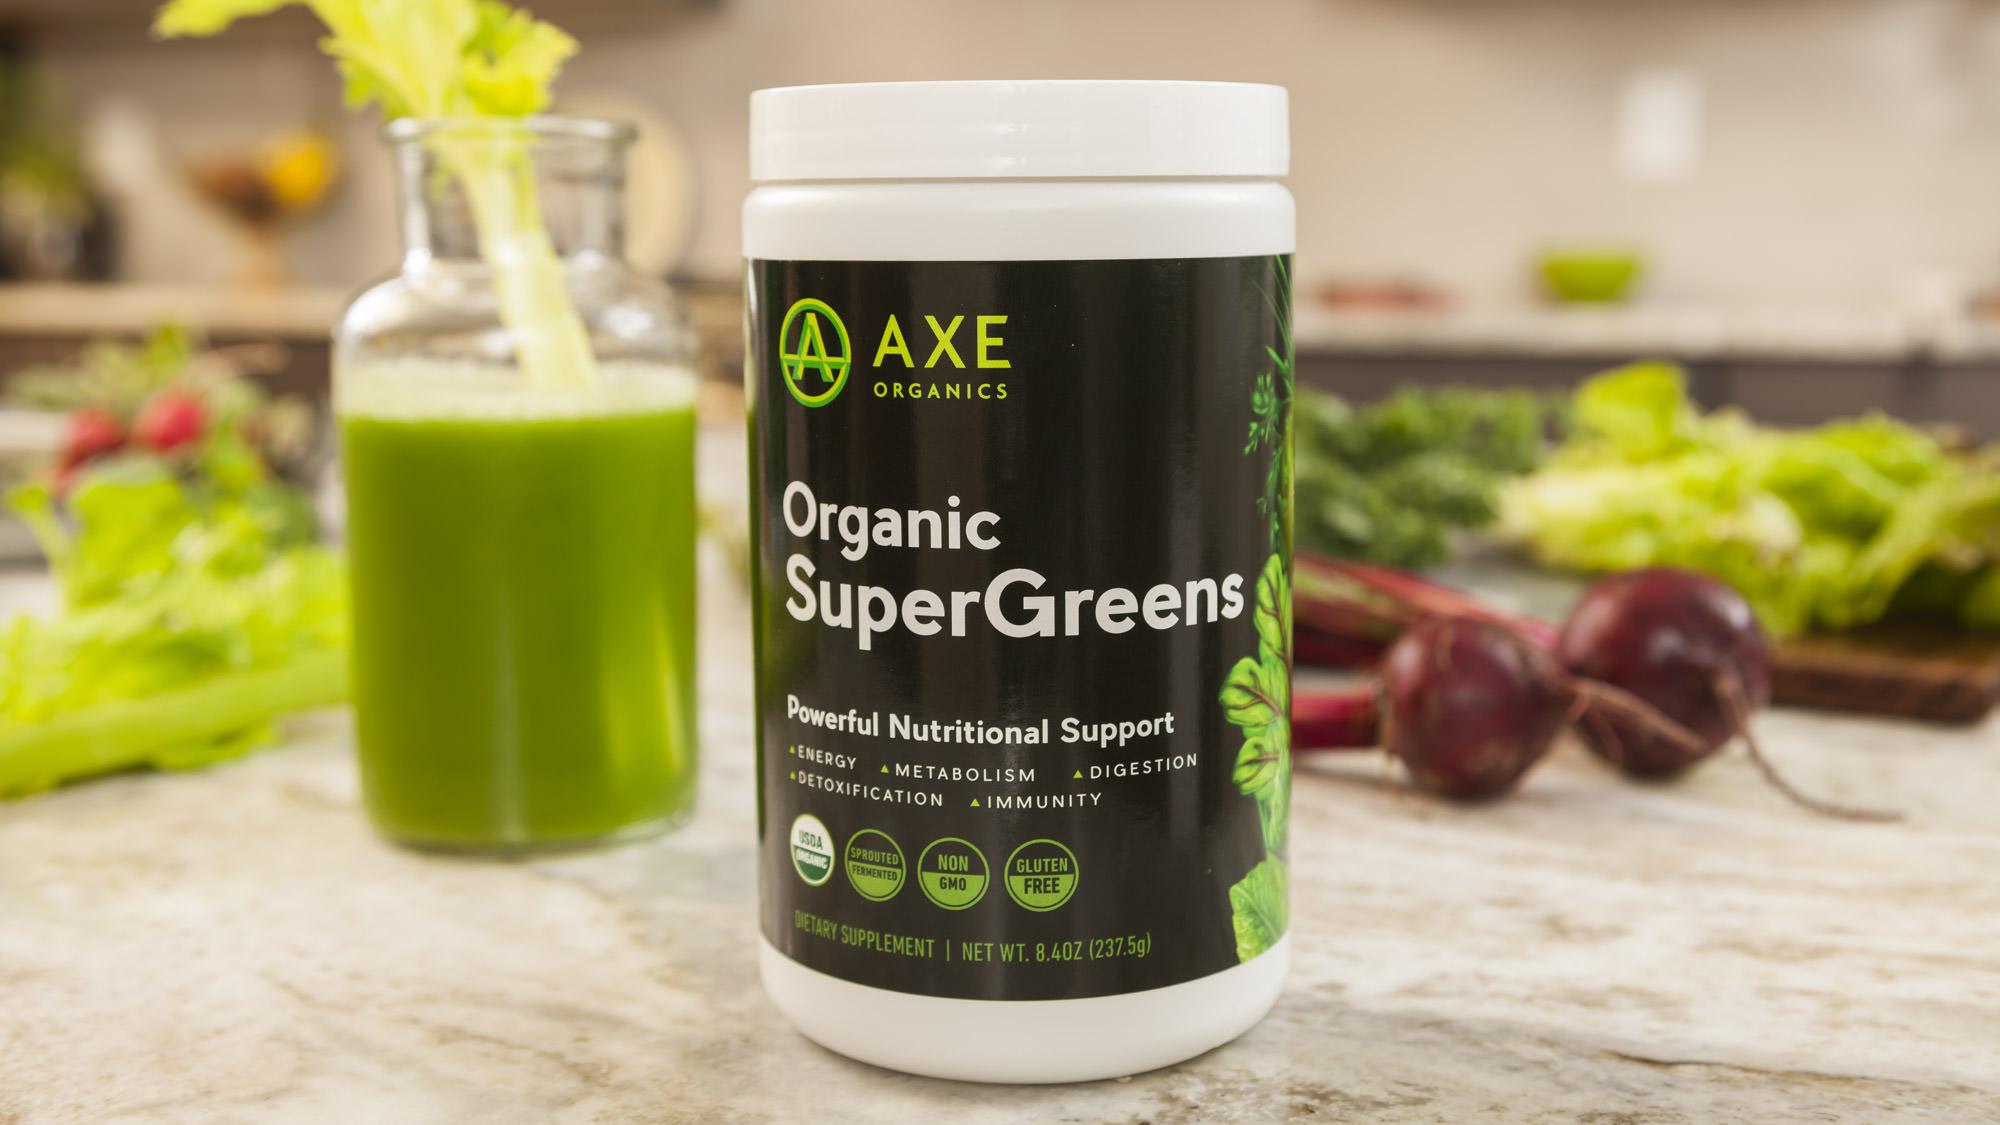 Axe organic supergreens